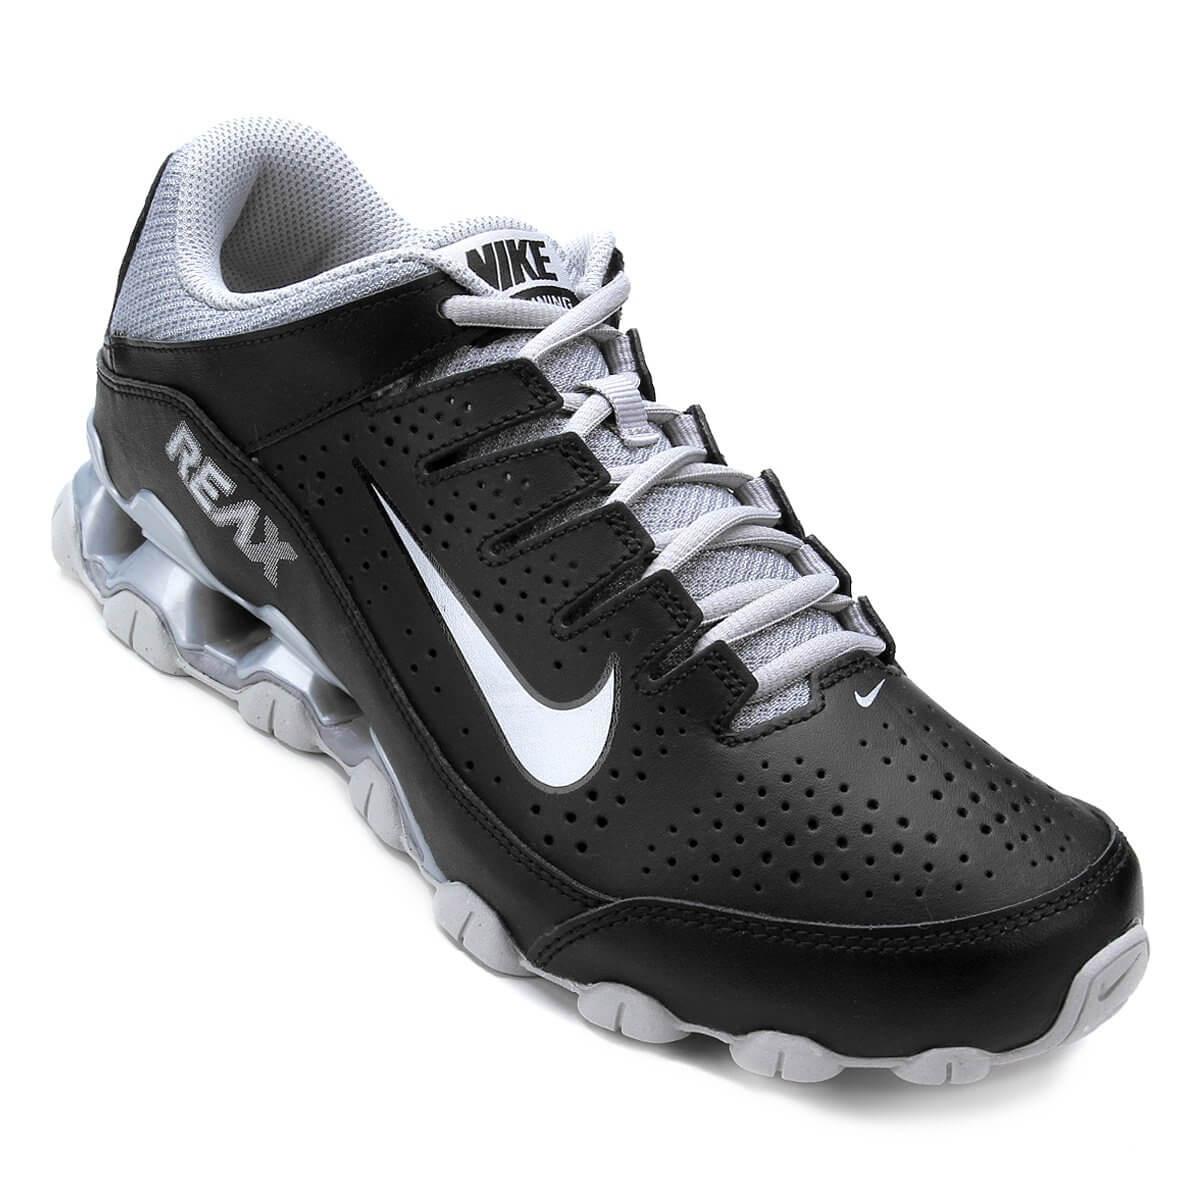 75481afe161 Tênis Nike Reax 8 Masculino - Decker Online!